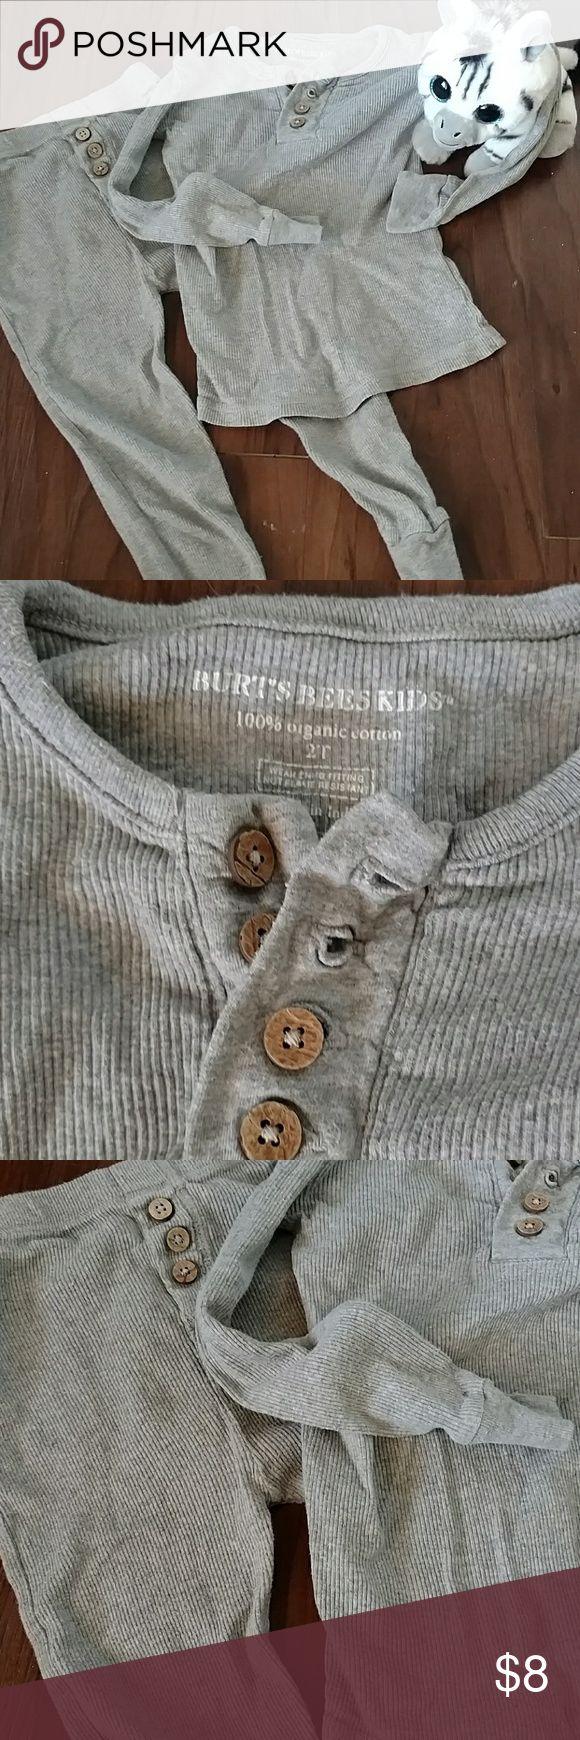 Burt's Bees pajamas Adorable Burt's Bees jammies. %100 organic cotton  🐝EUC (tiny rust spot from safety pin on back of pants -pic #4) 🐝Smoke free 🐝Please... no offers below $5 unless you are bundling. Burt's Bees Baby Pajamas Pajama Sets